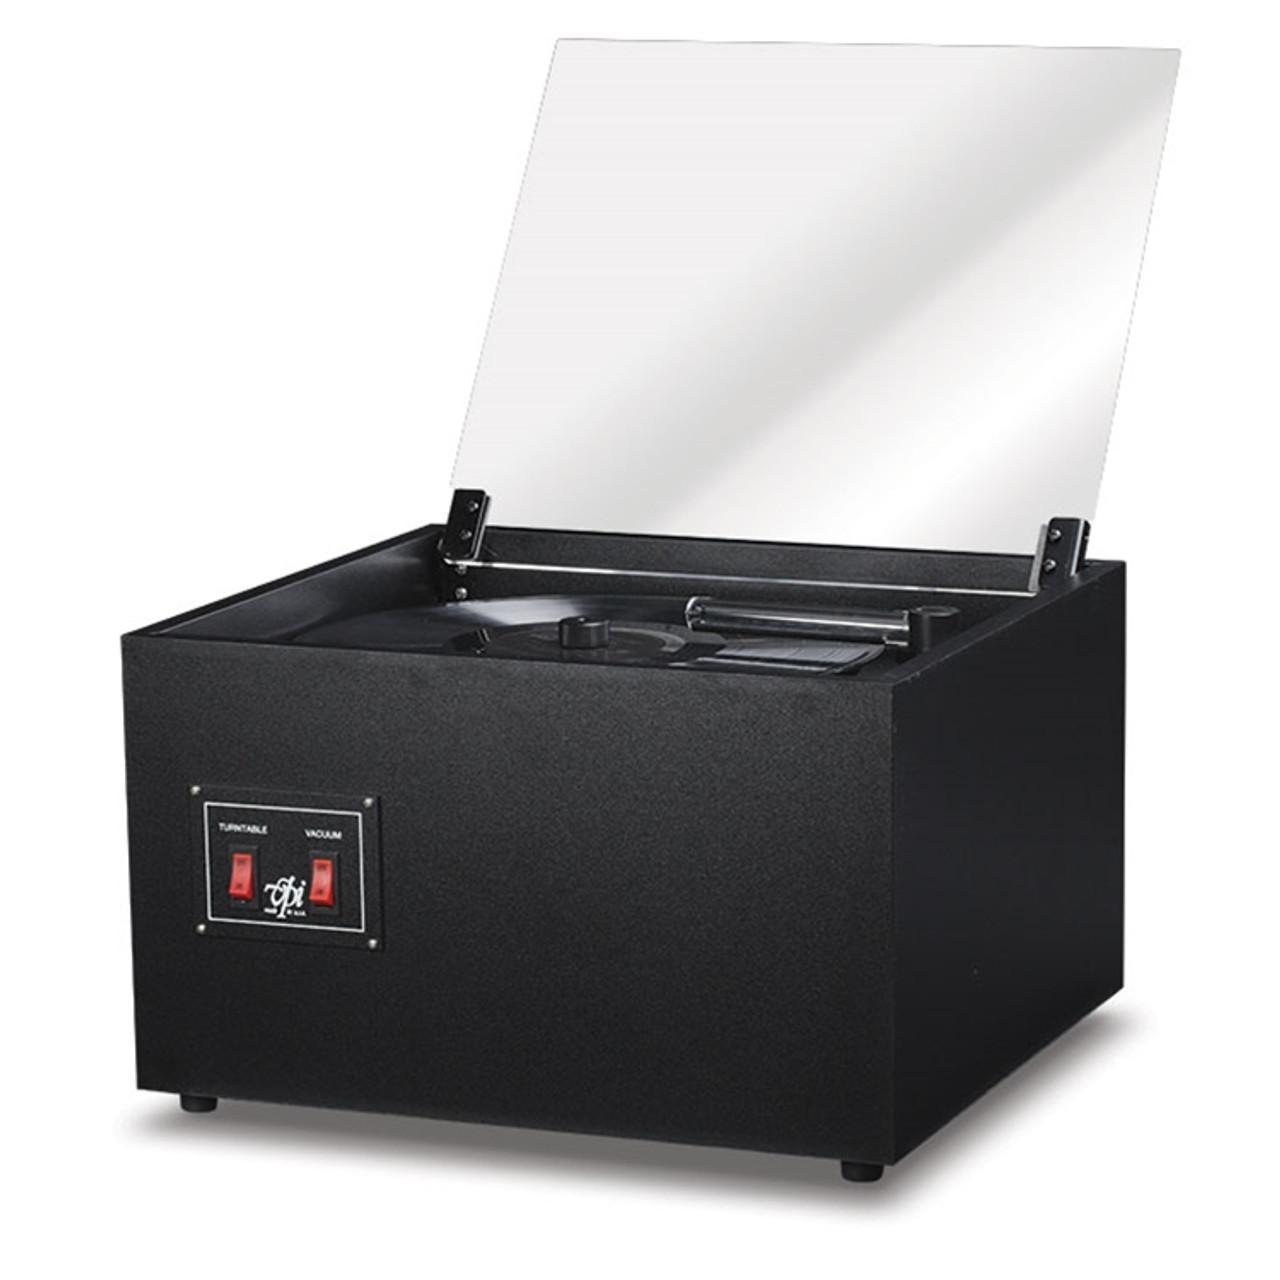 VPI HW-16.5 record cleaning machine